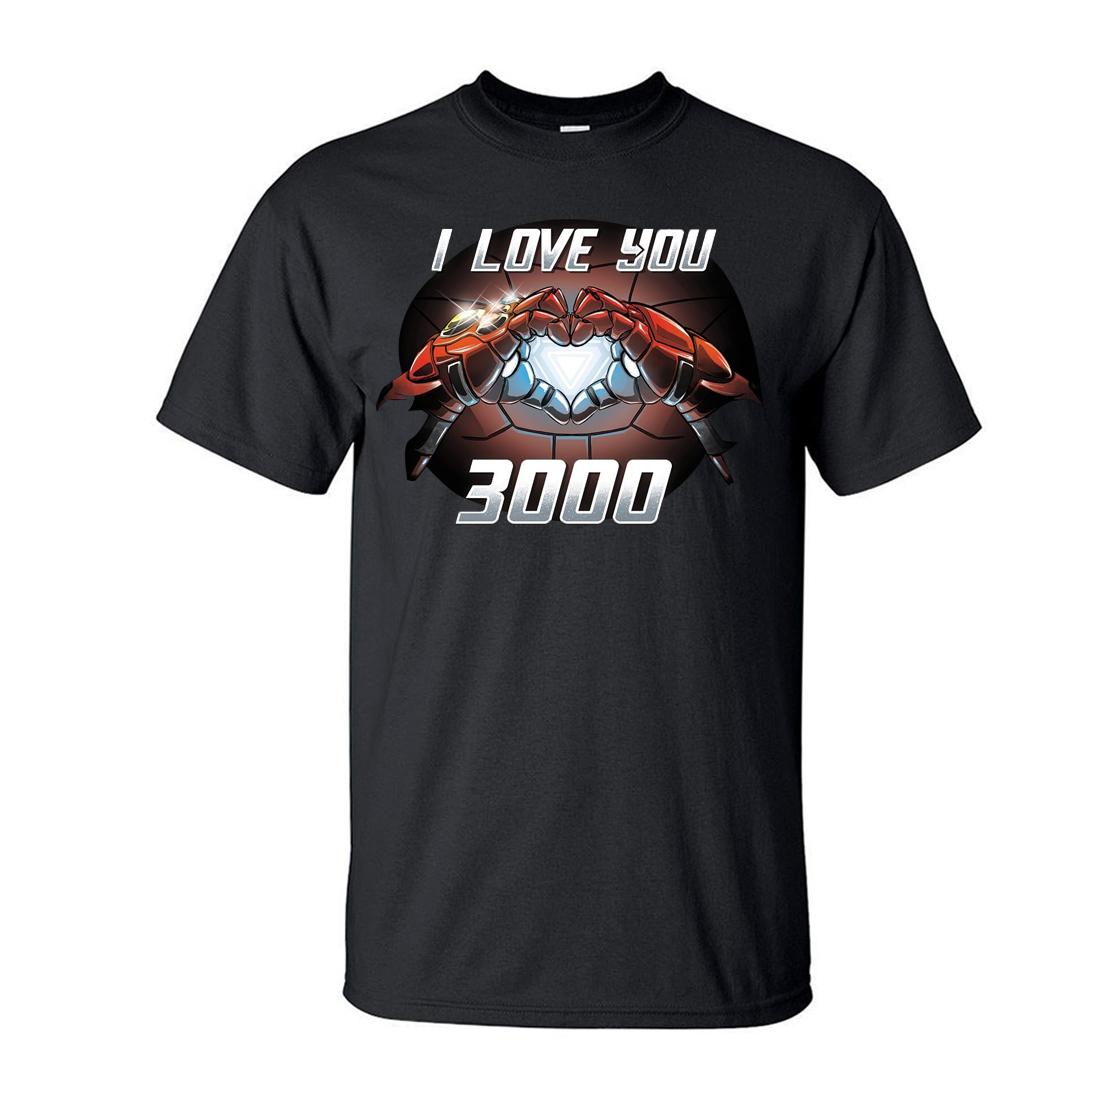 TonyStark ILove You 3000 T-ShirtMen The Avengers IronManMoiveShirt 2019 NewSummer Casual PlusSize Tops TeesS-3XL